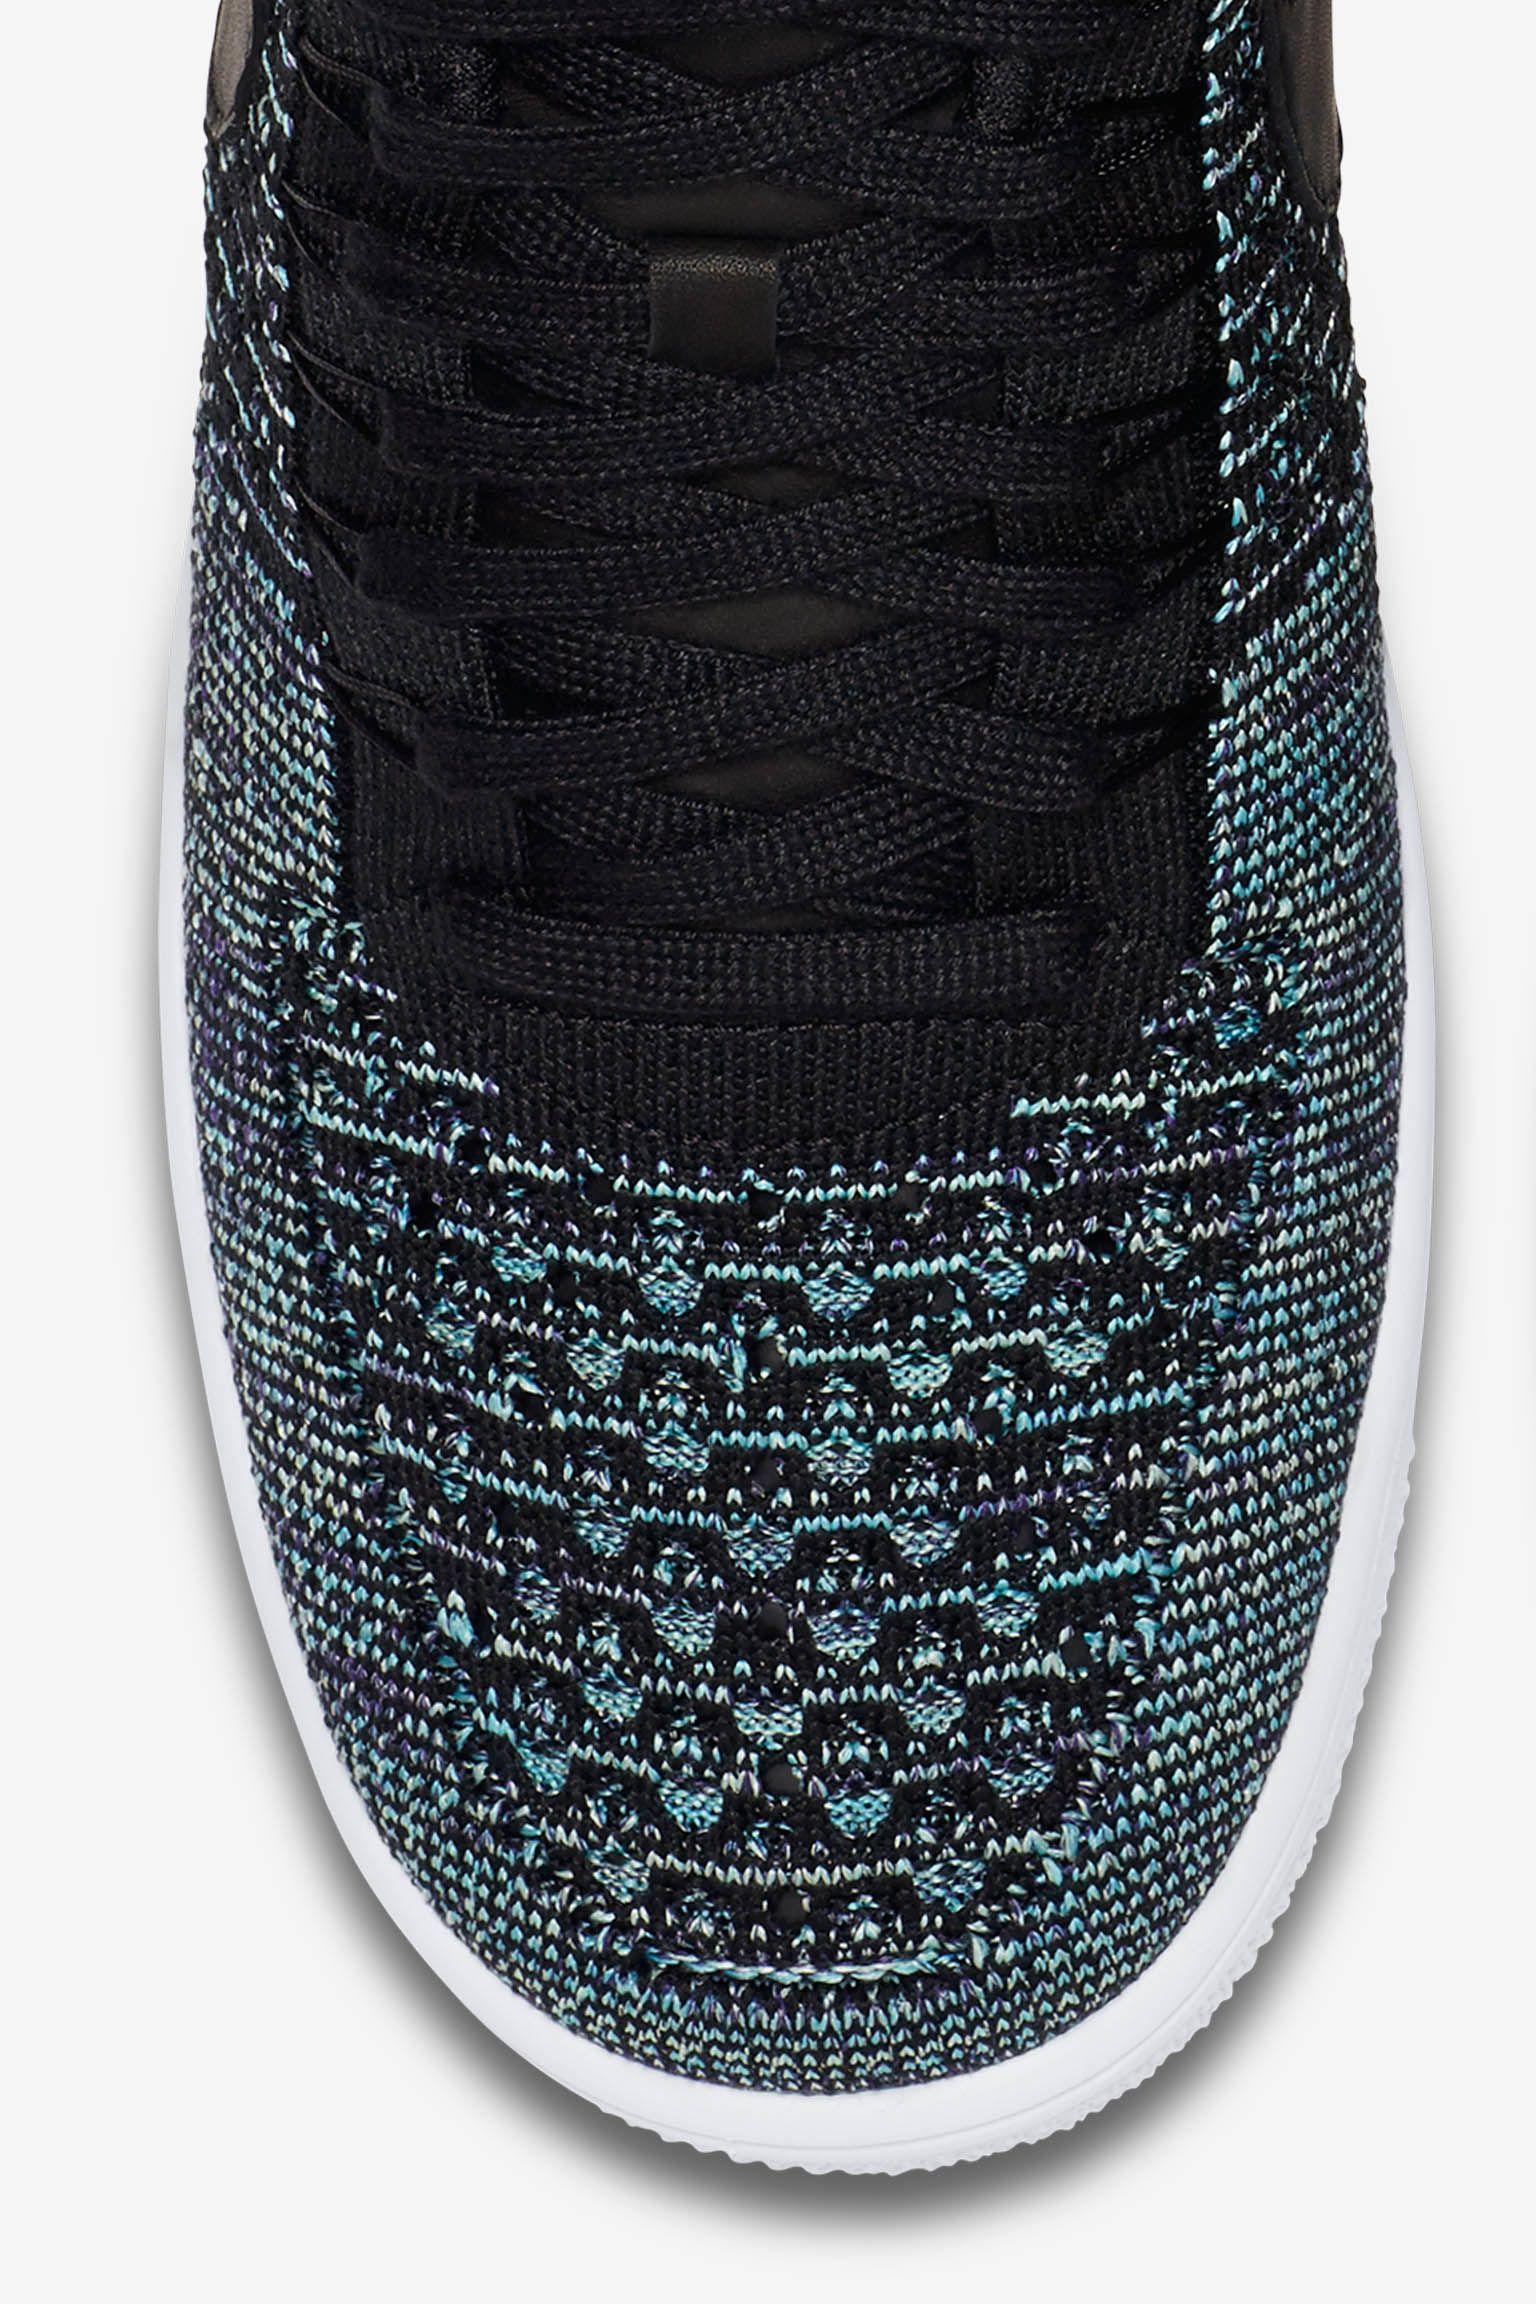 Nike Air Force 1 Low Flyknit 'vapor green a černá'